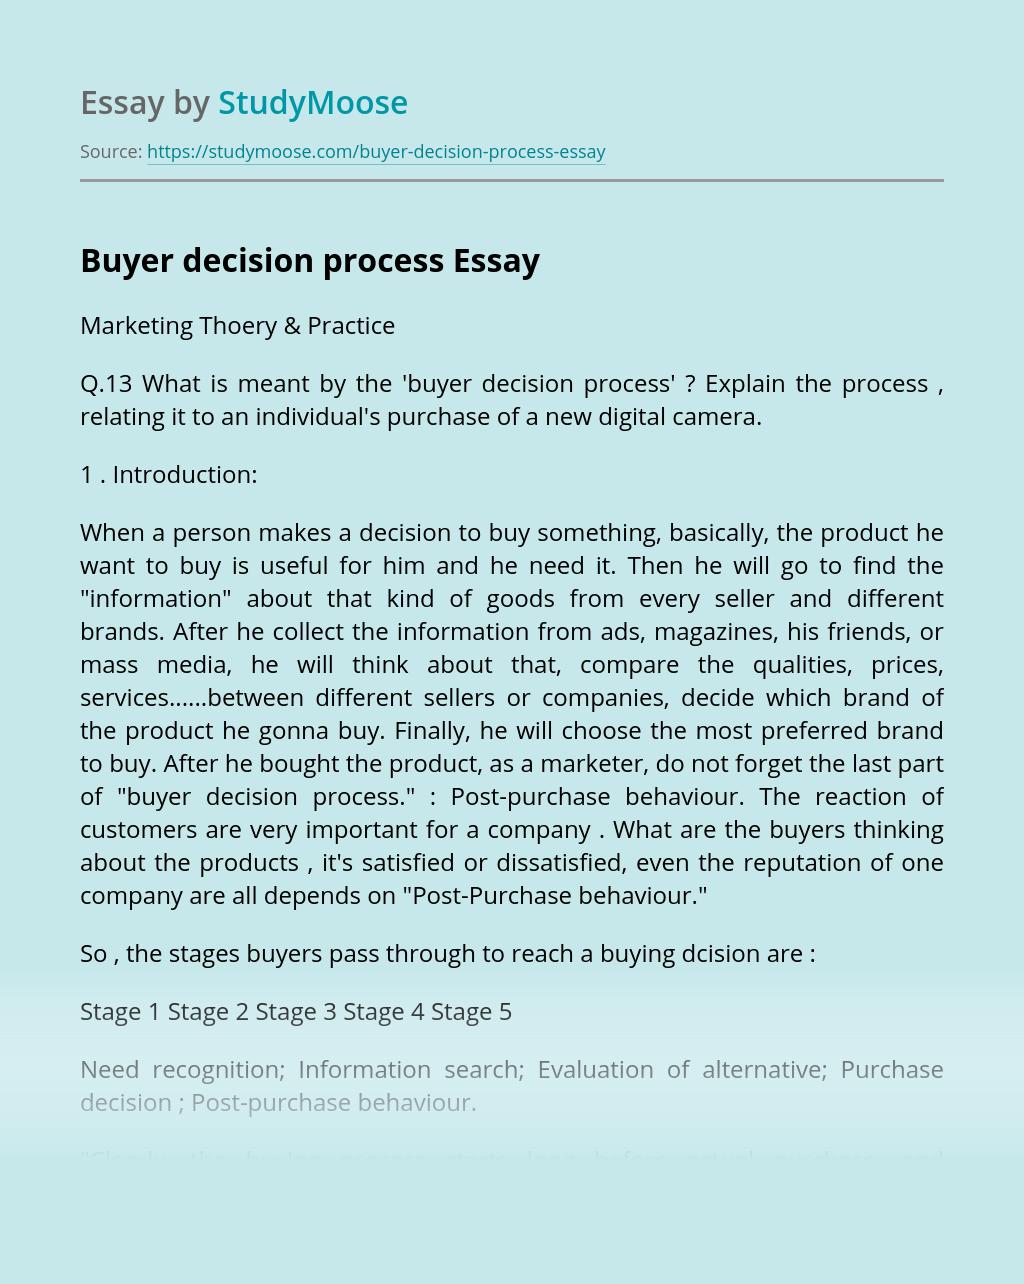 Buyer decision process